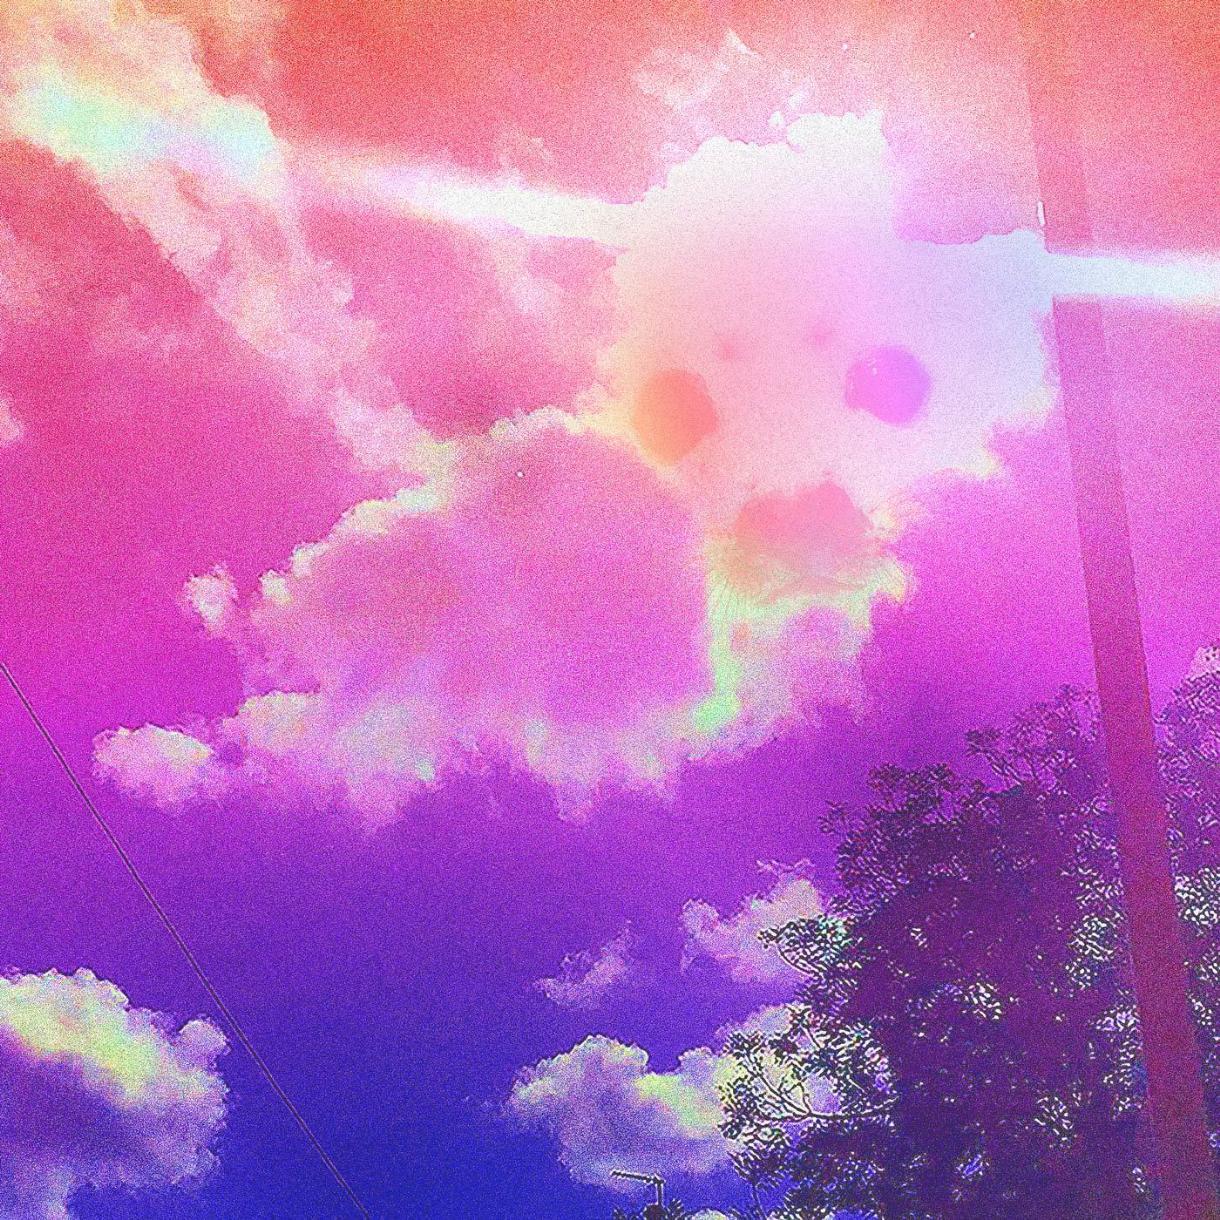 listen-to-all-of-rusties-album-evenifudontbelieve-body-image-1446749400